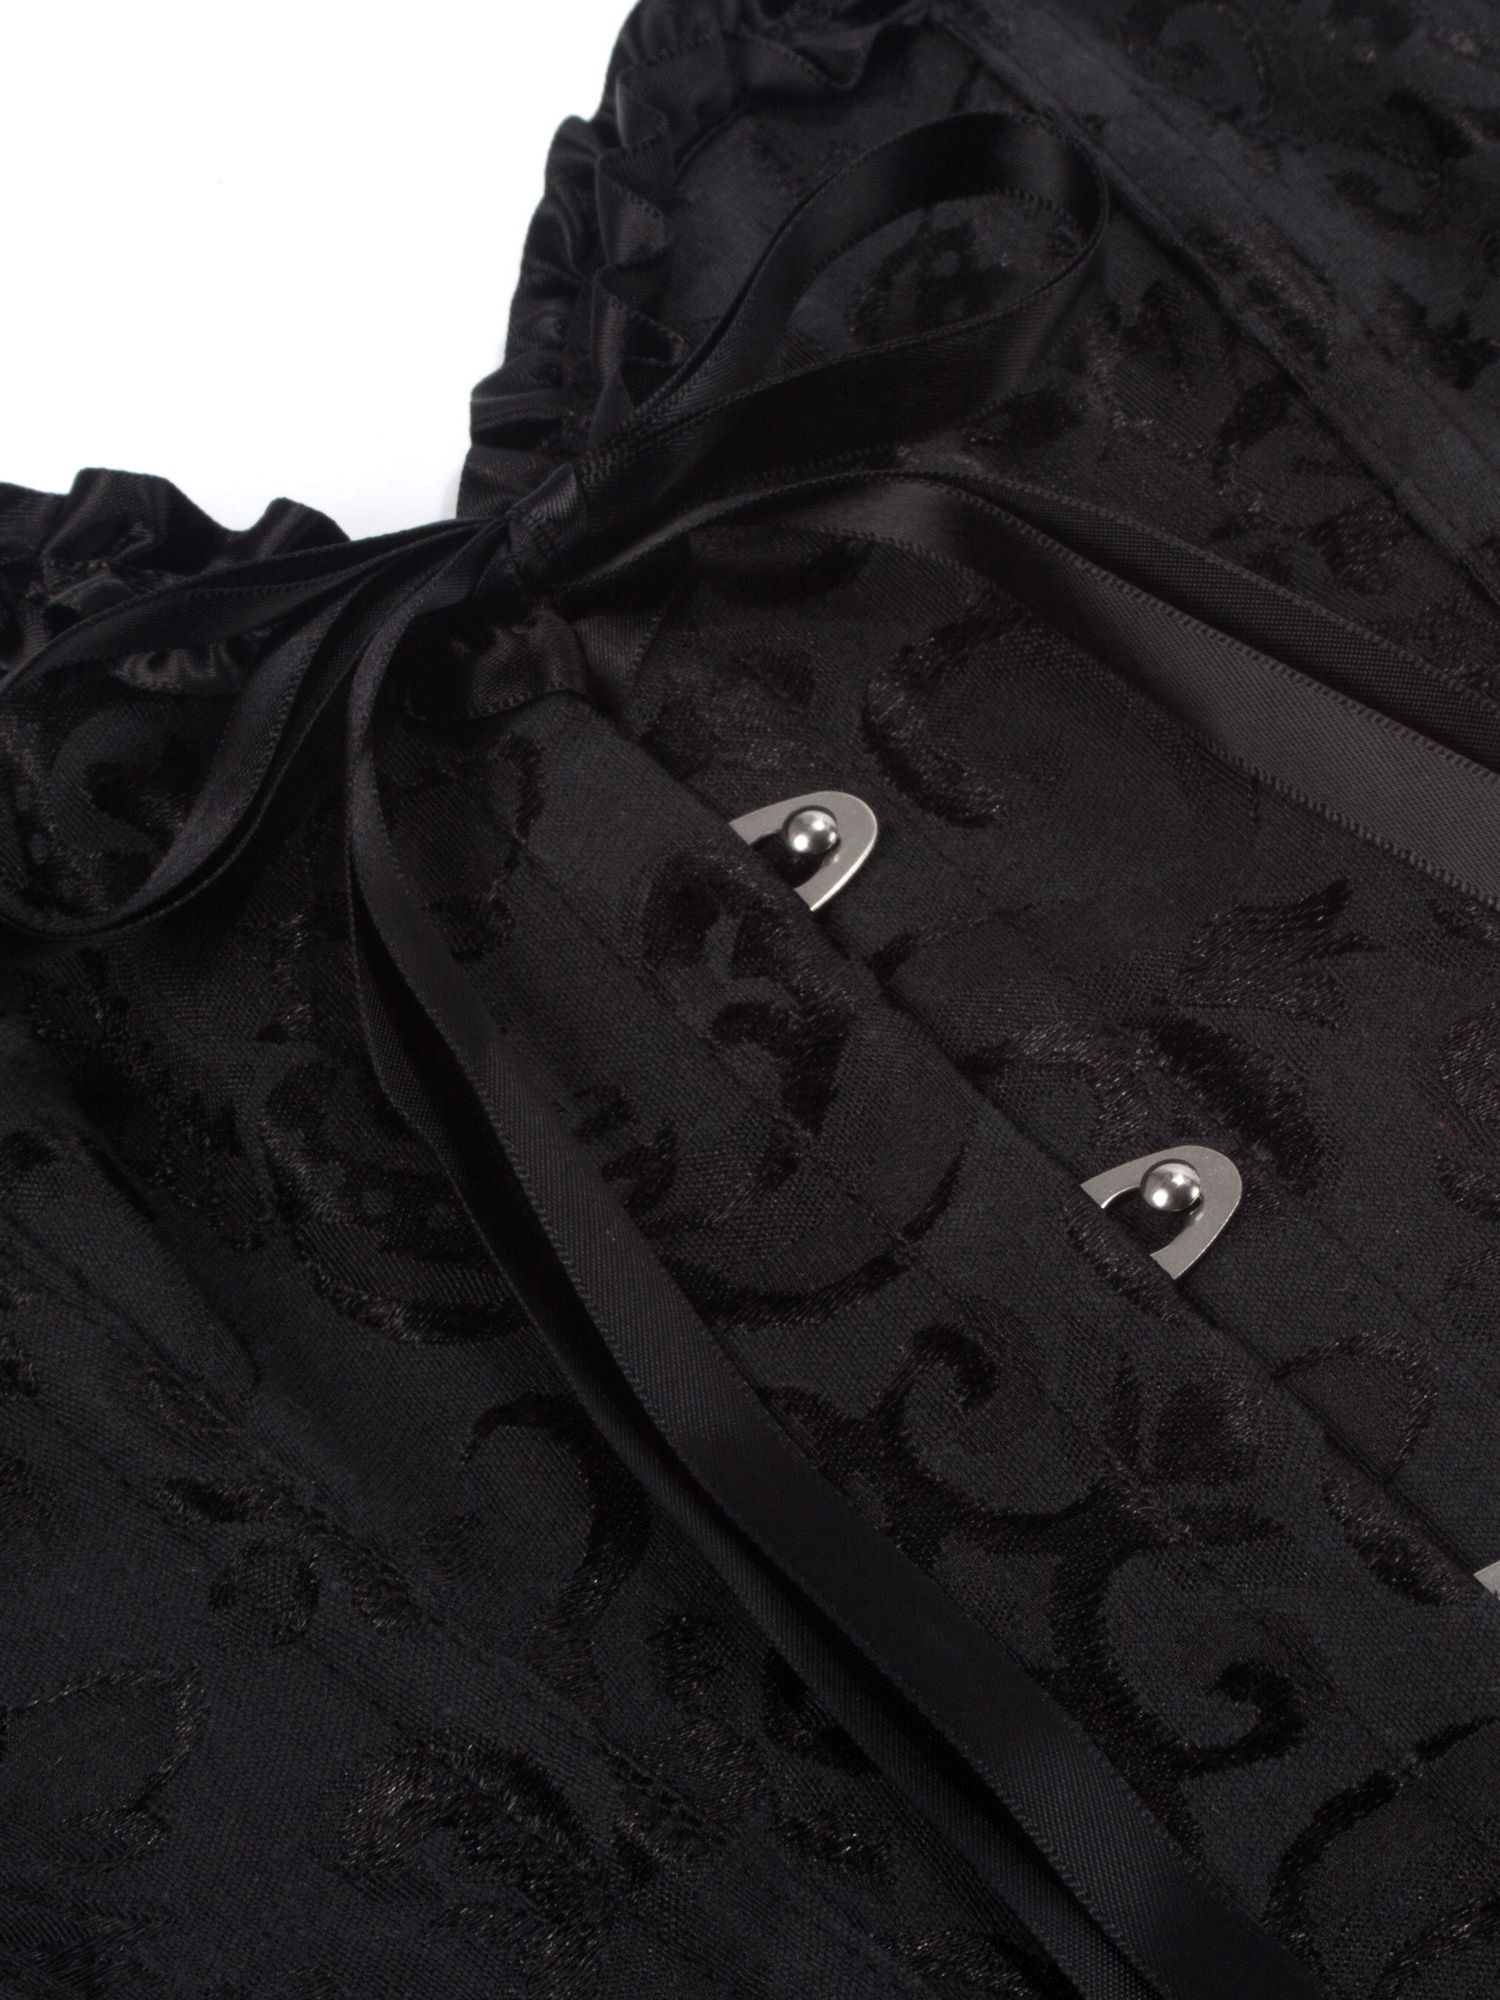 e685f75c5a SAYFUT Fashion Women s Lace Up Boned Sexy Overbust Corset Bustier Plus Size  Bodyshaper Top with G